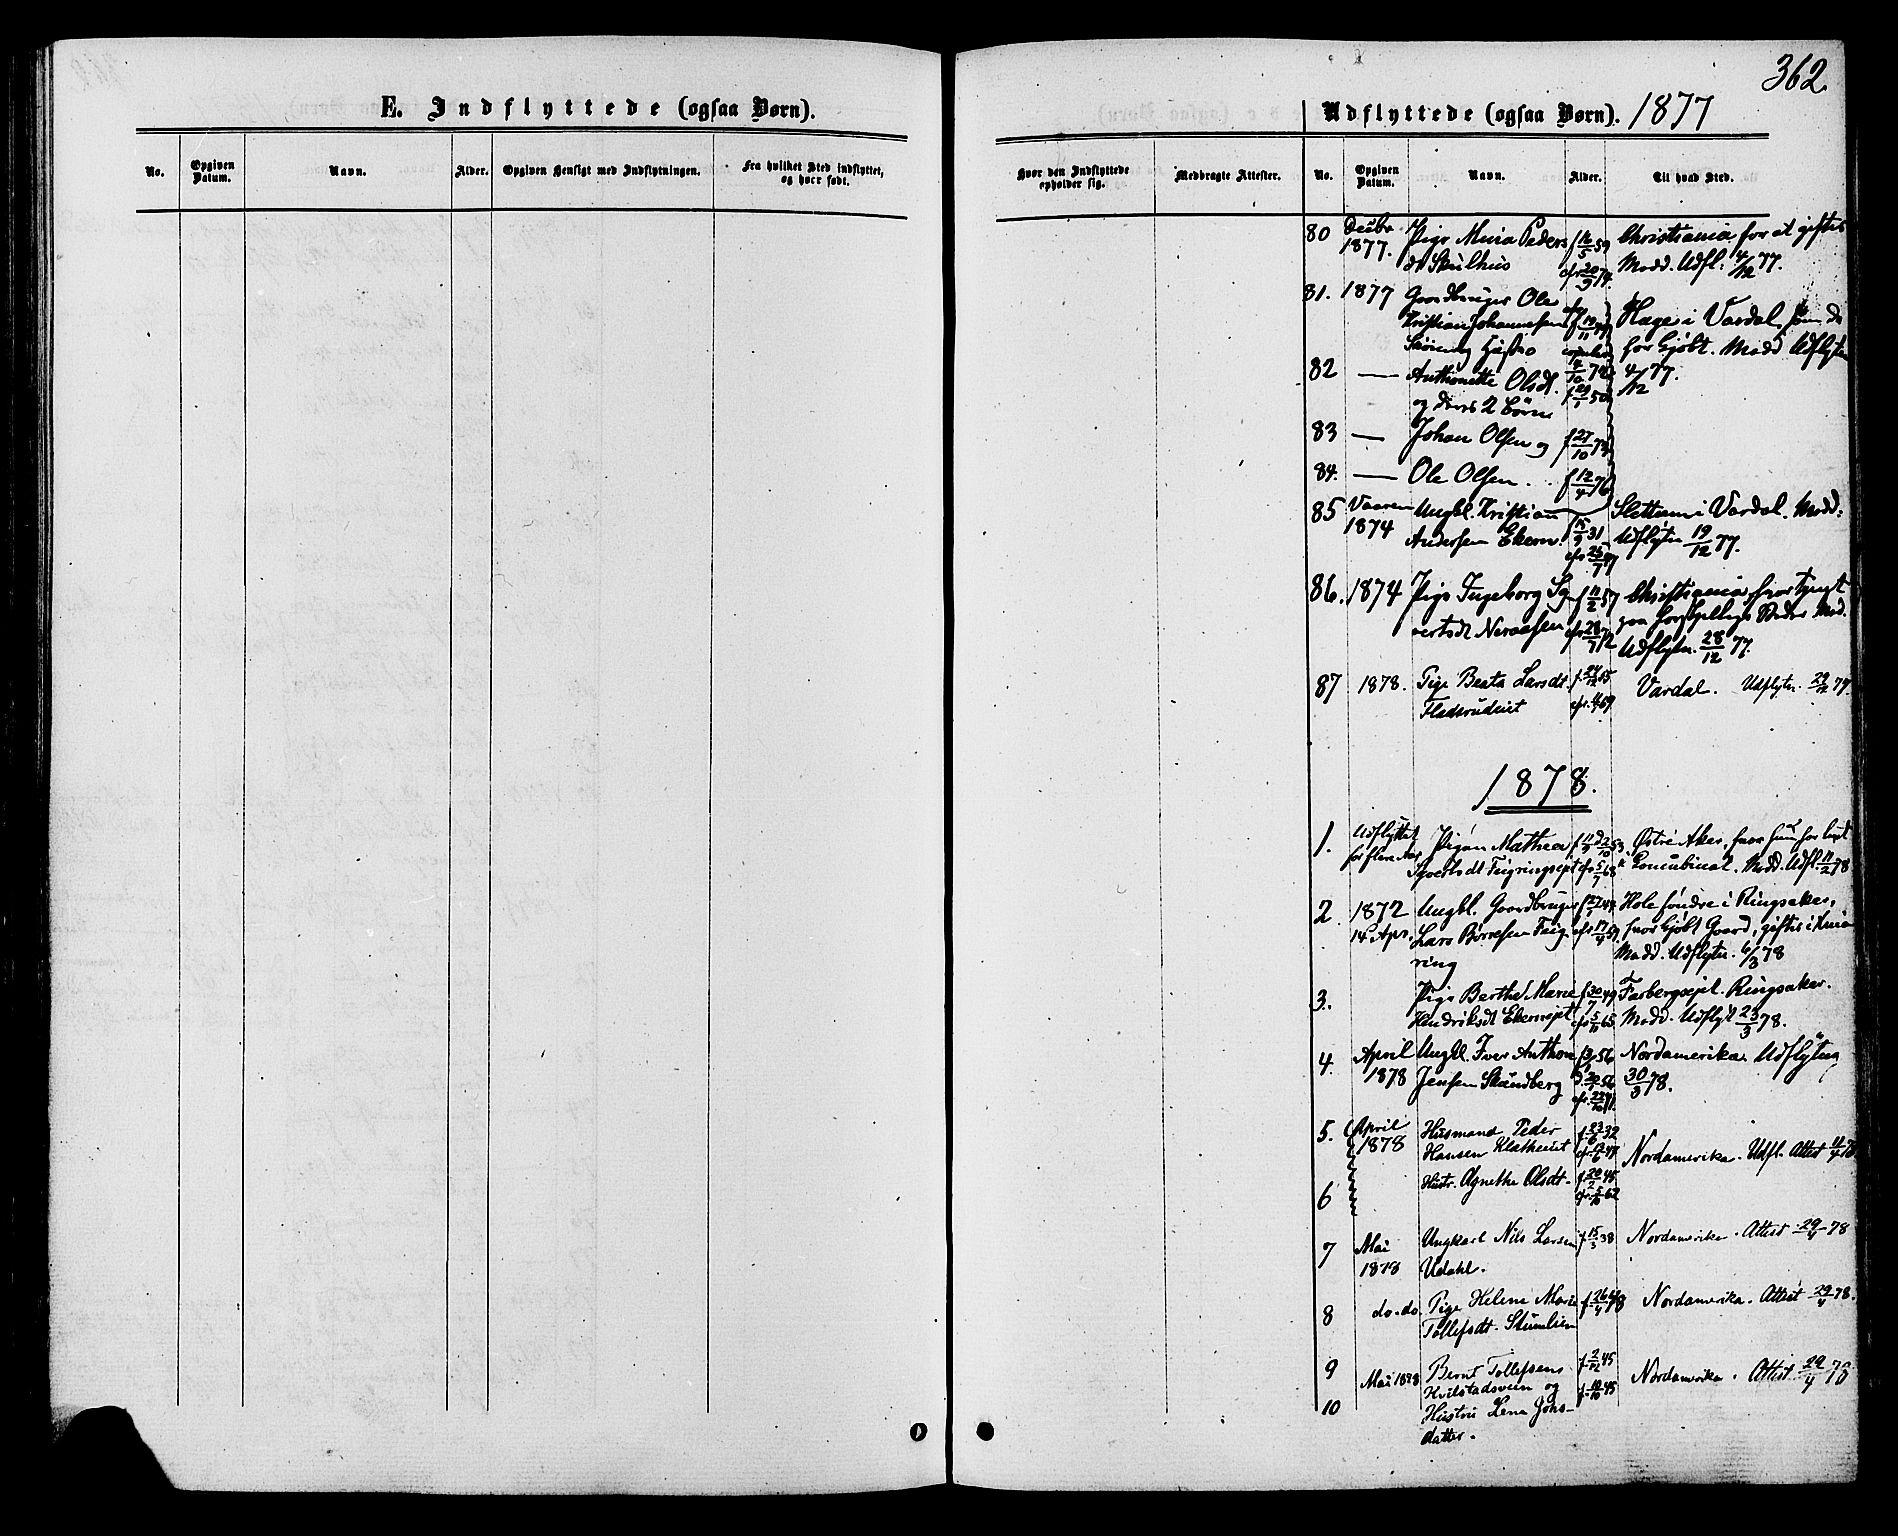 SAH, Biri prestekontor, Ministerialbok nr. 6, 1877-1886, s. 362